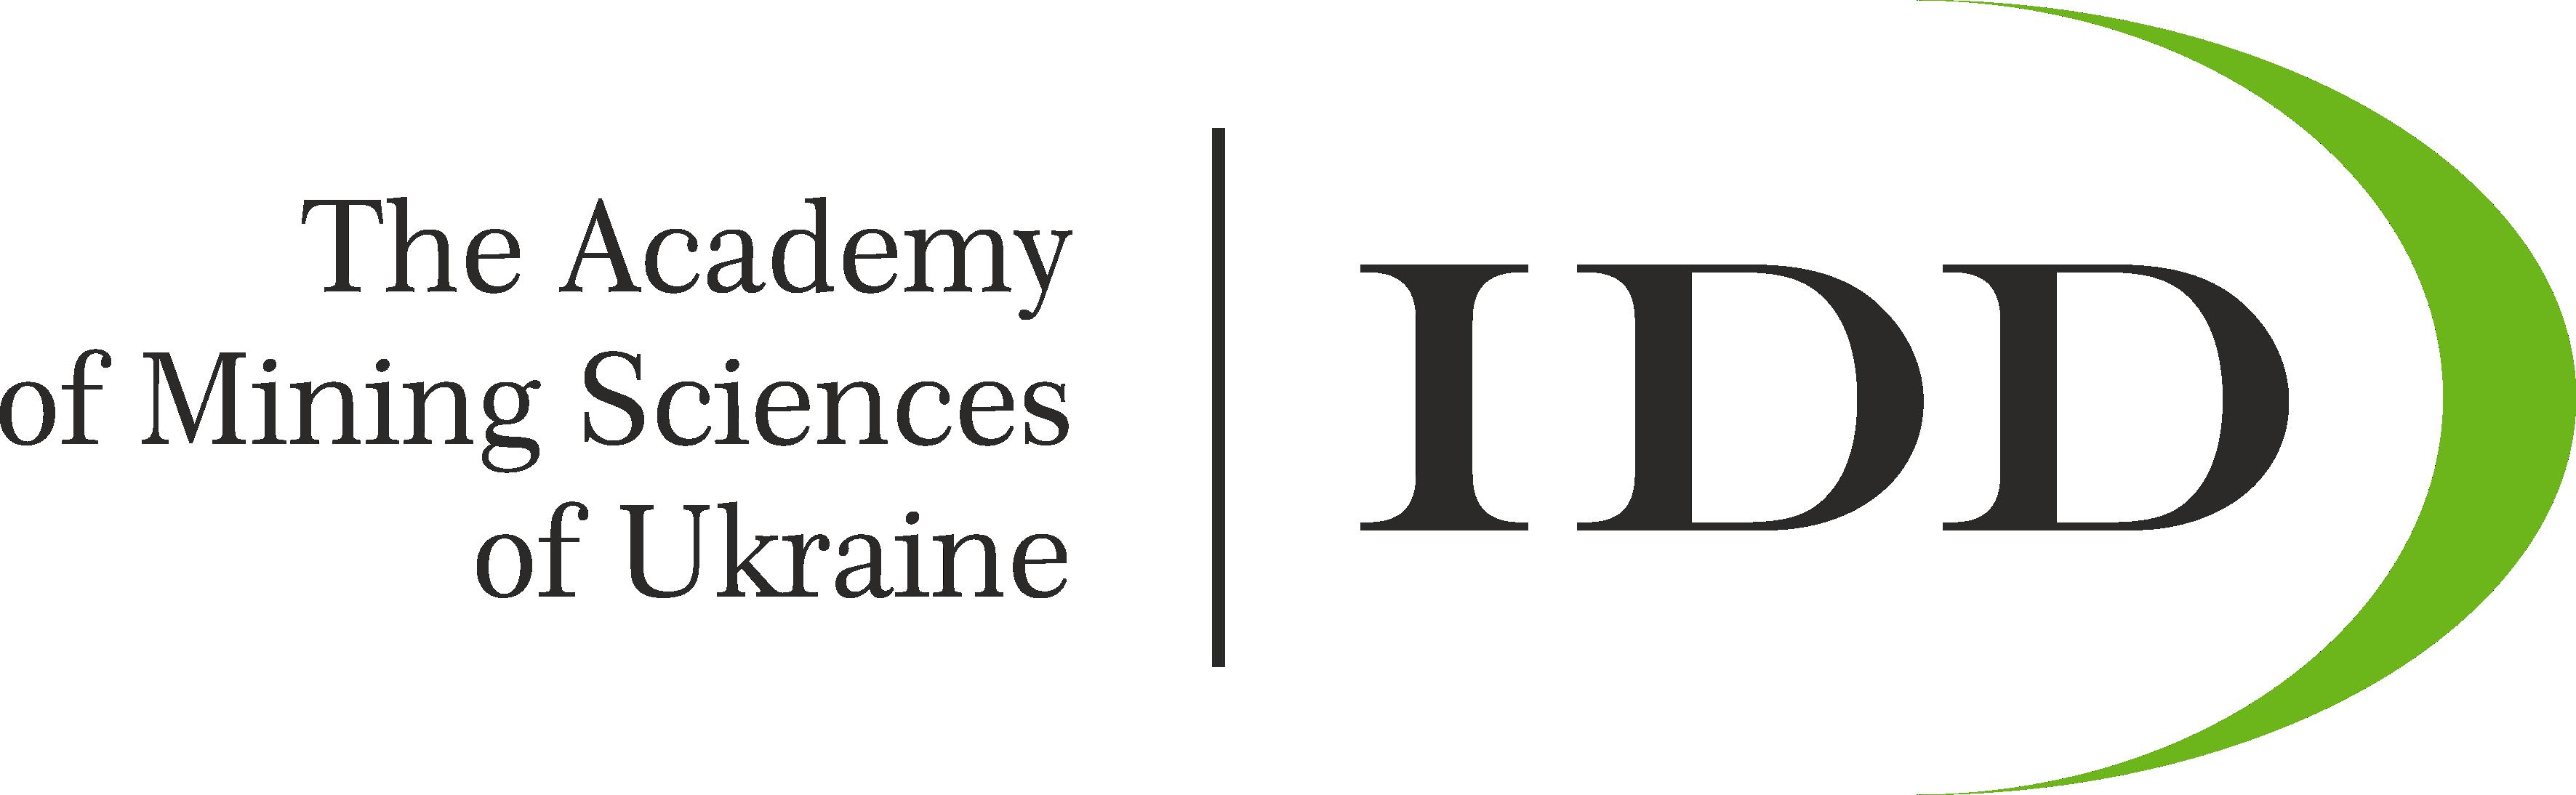 The Academy of Mining Sciences of Ukraine